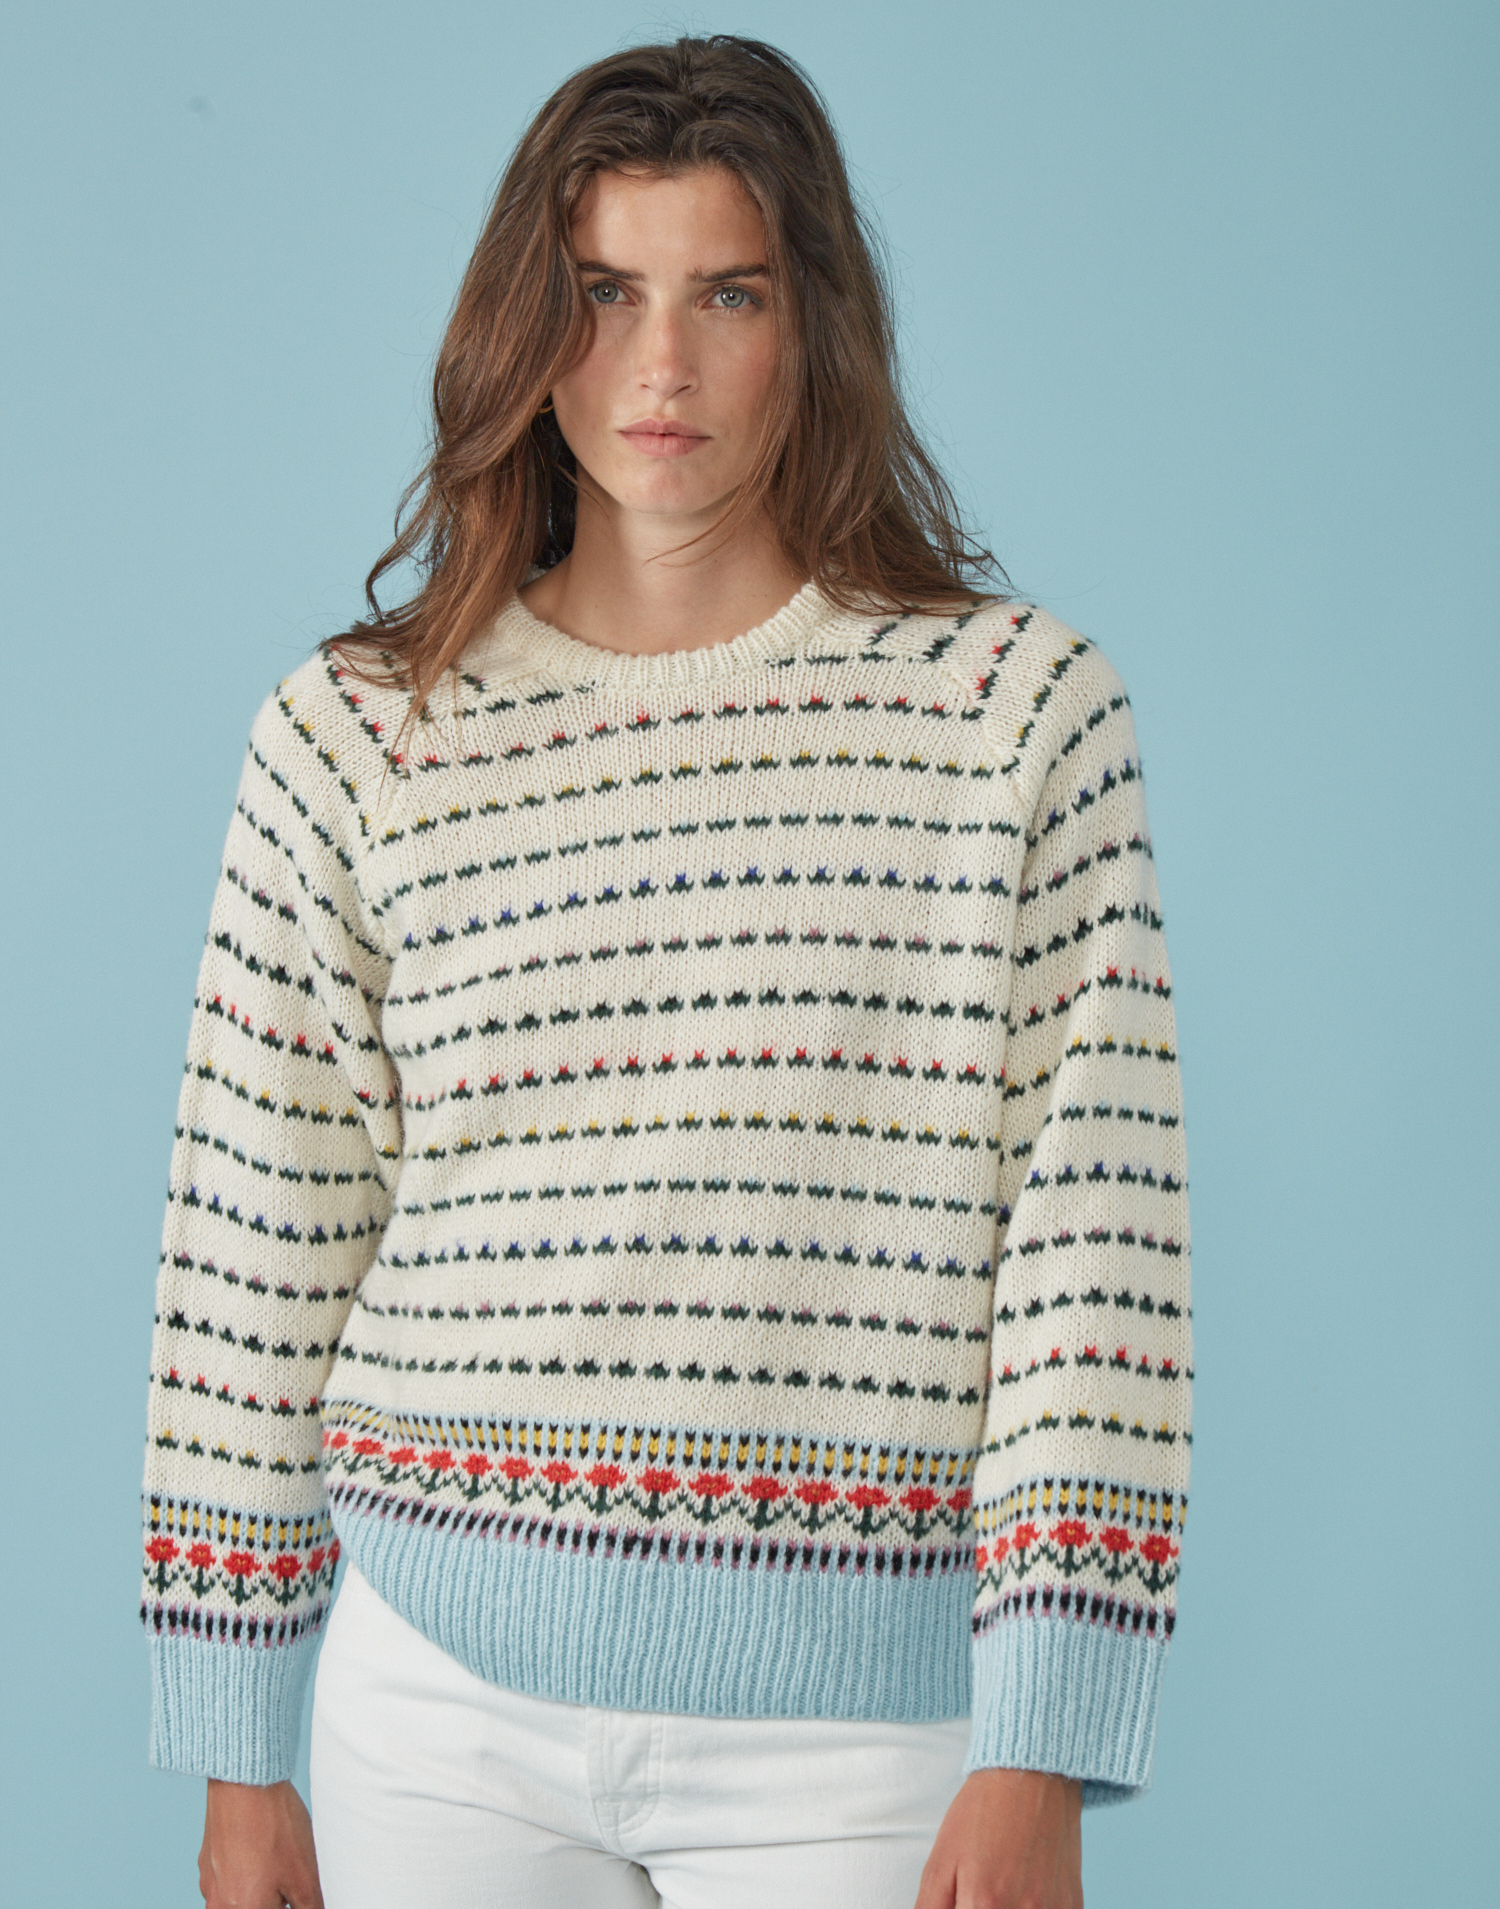 Floral jacquard knit sweater